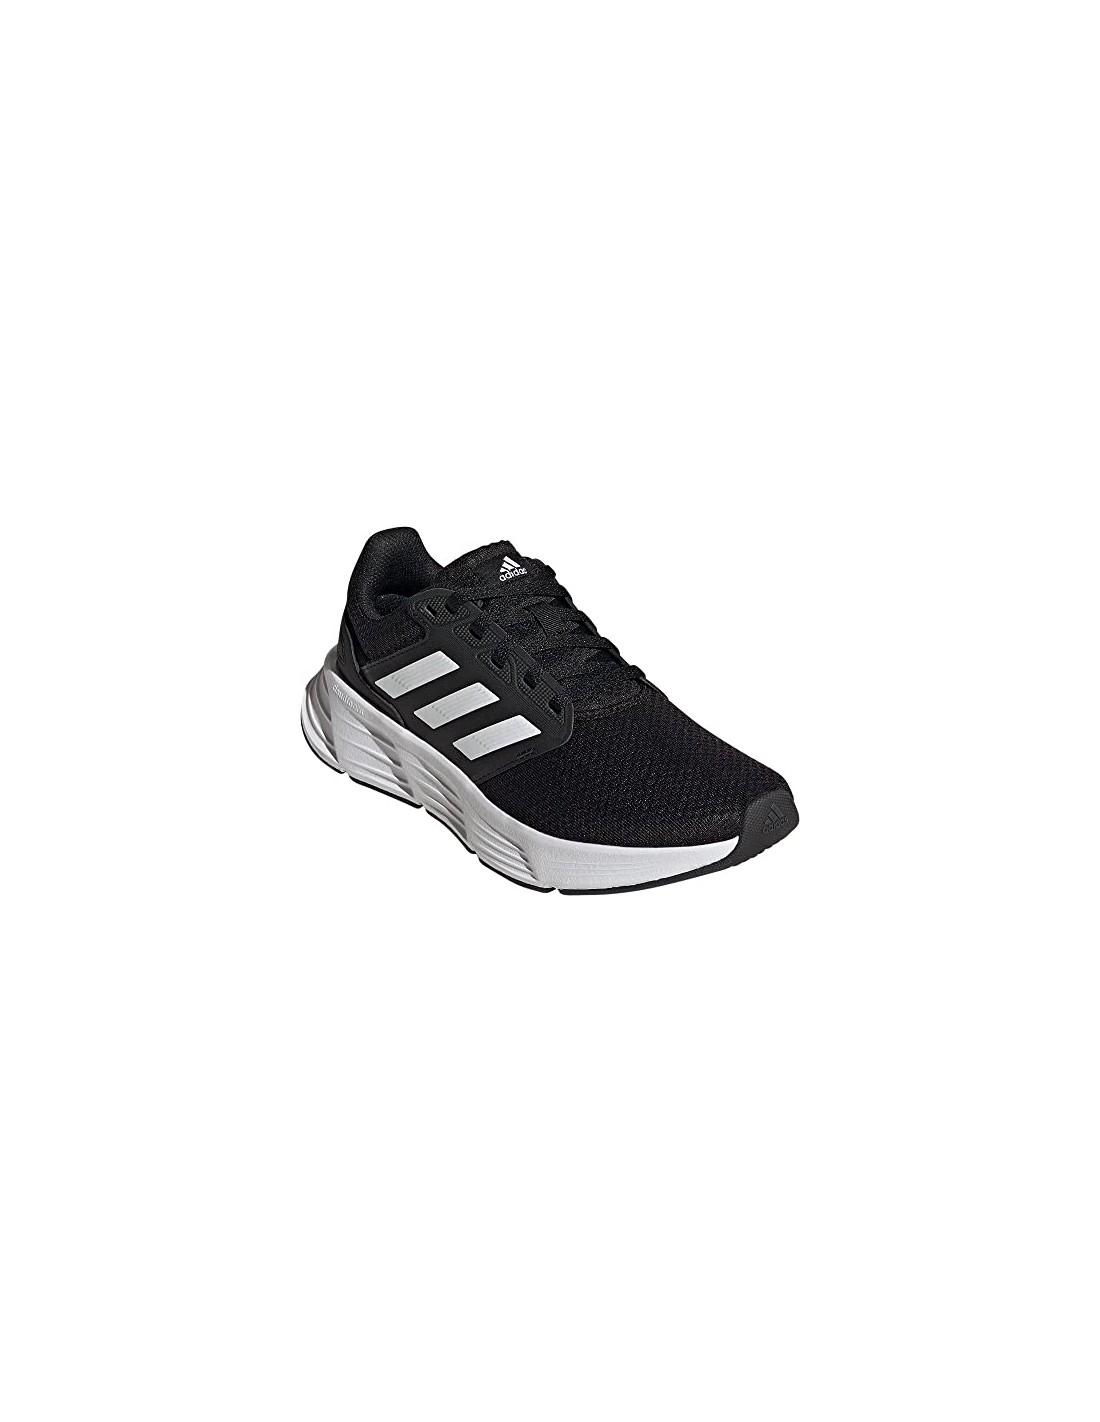 new concept 5db3f f1922 Zapatillas de trekking AX2 CP K ONIX-NEG ...